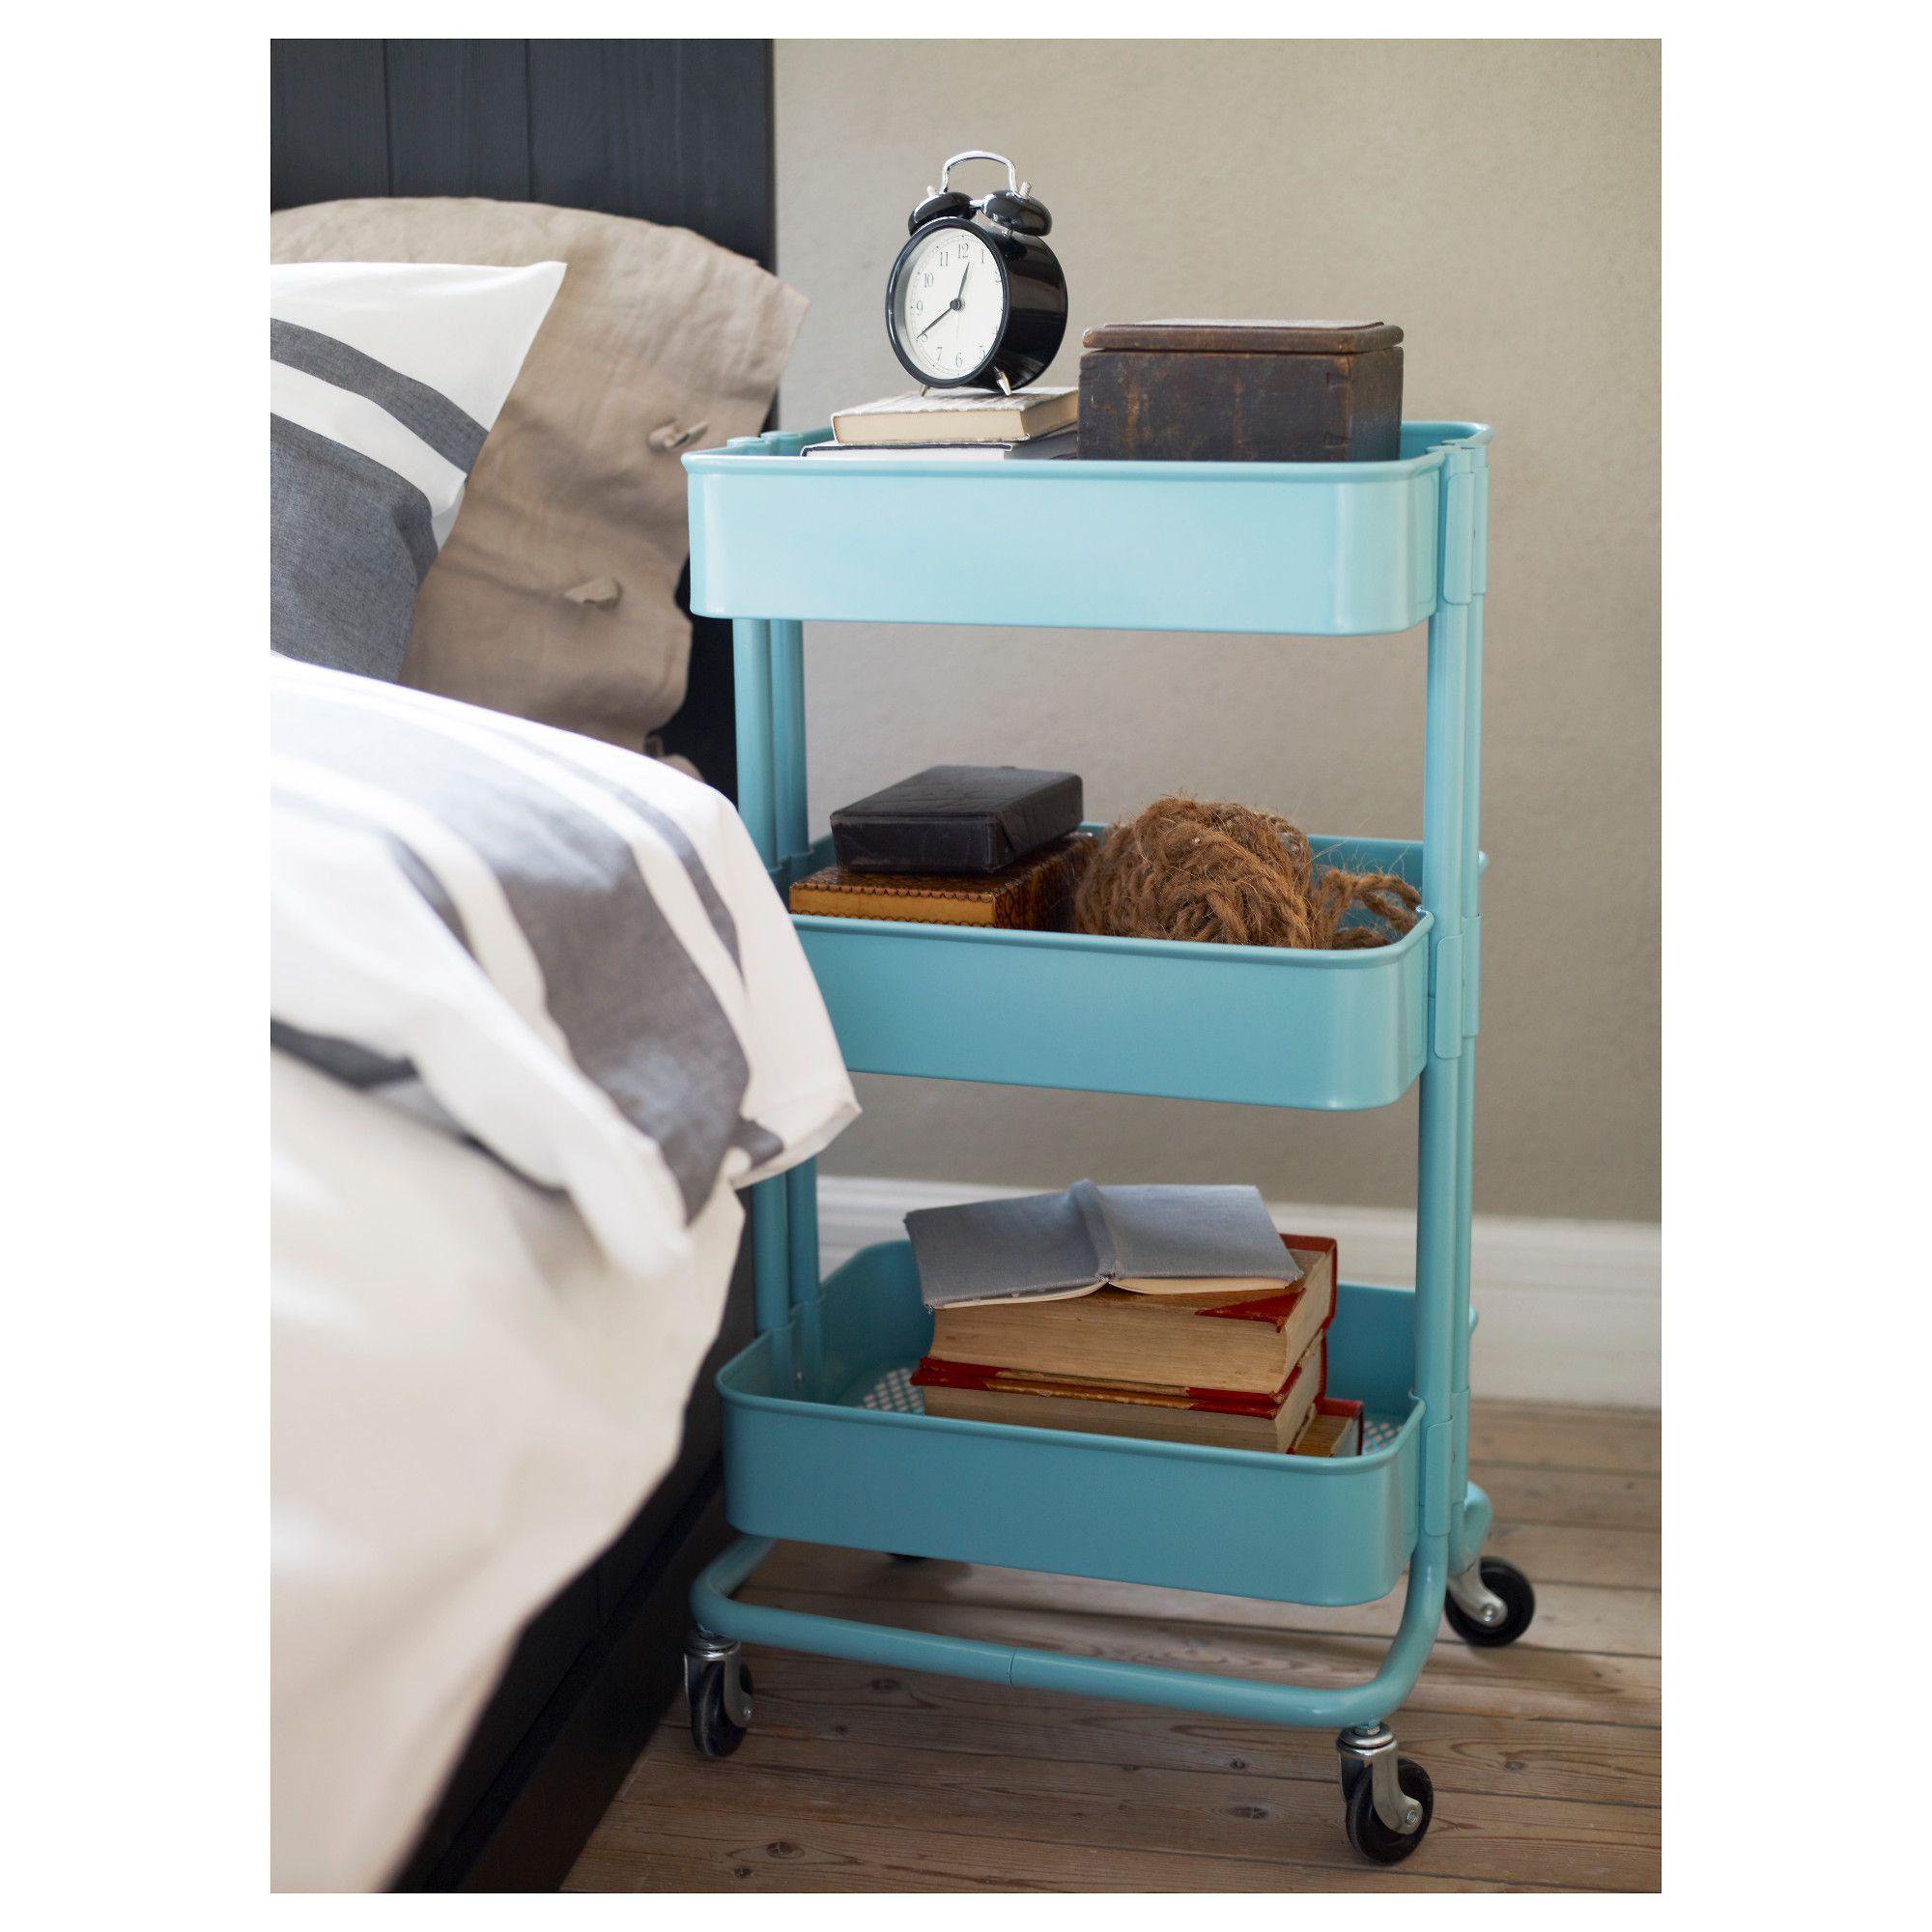 An IKEA Raskog Utility Cart Used As A Bedside Table.